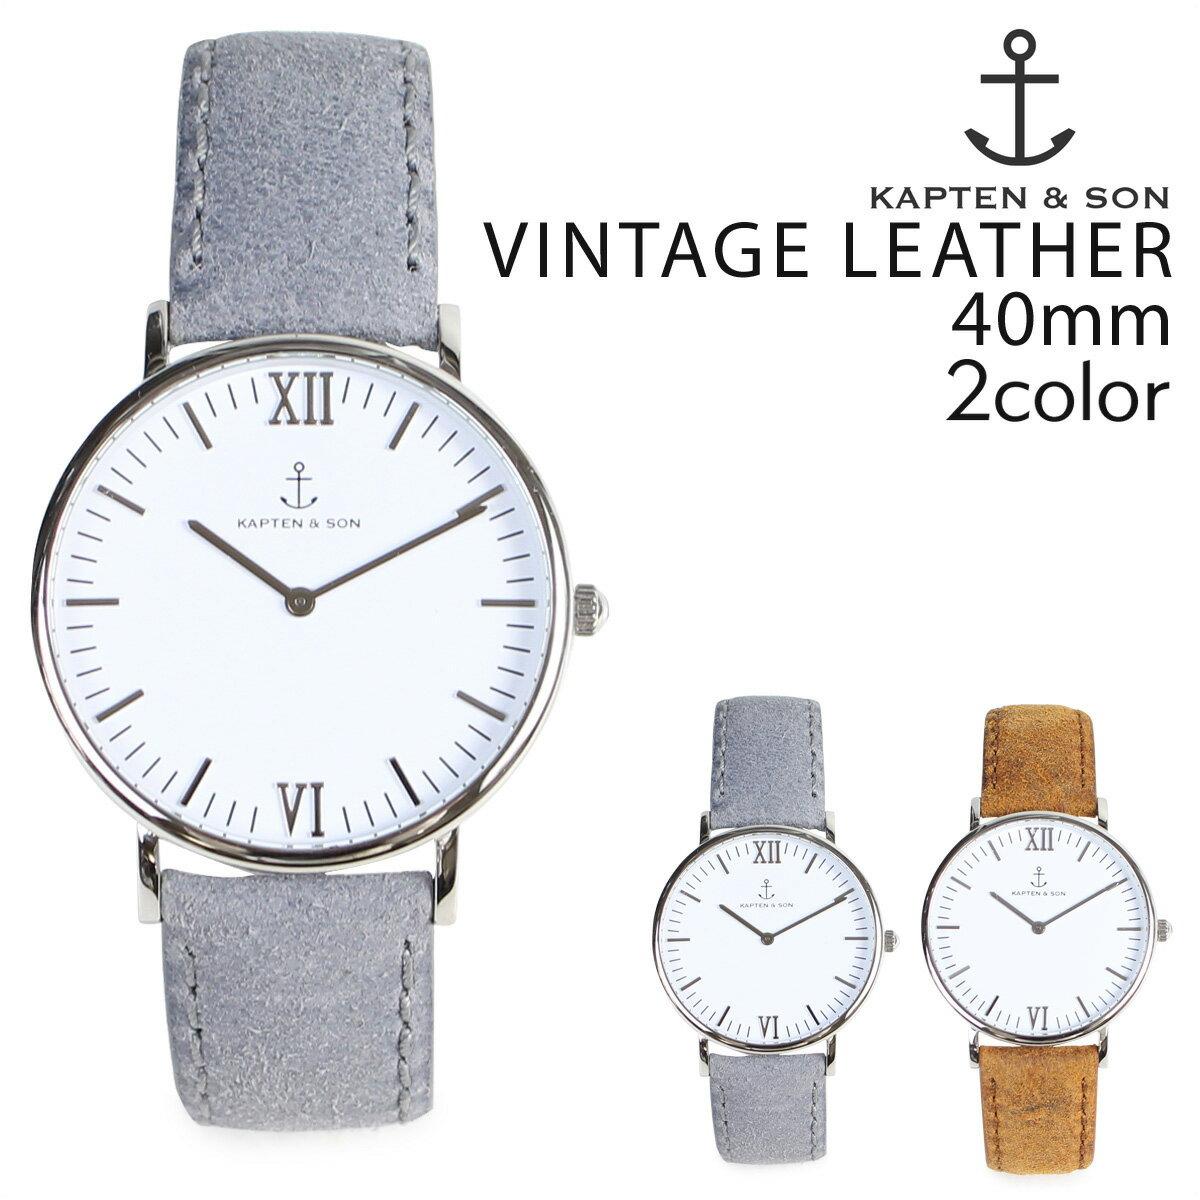 KAPTEN&SON4 キャプテンアンドサン 腕時計 時計 レディース 40mm レザー VINTAGE LEATHER グレー